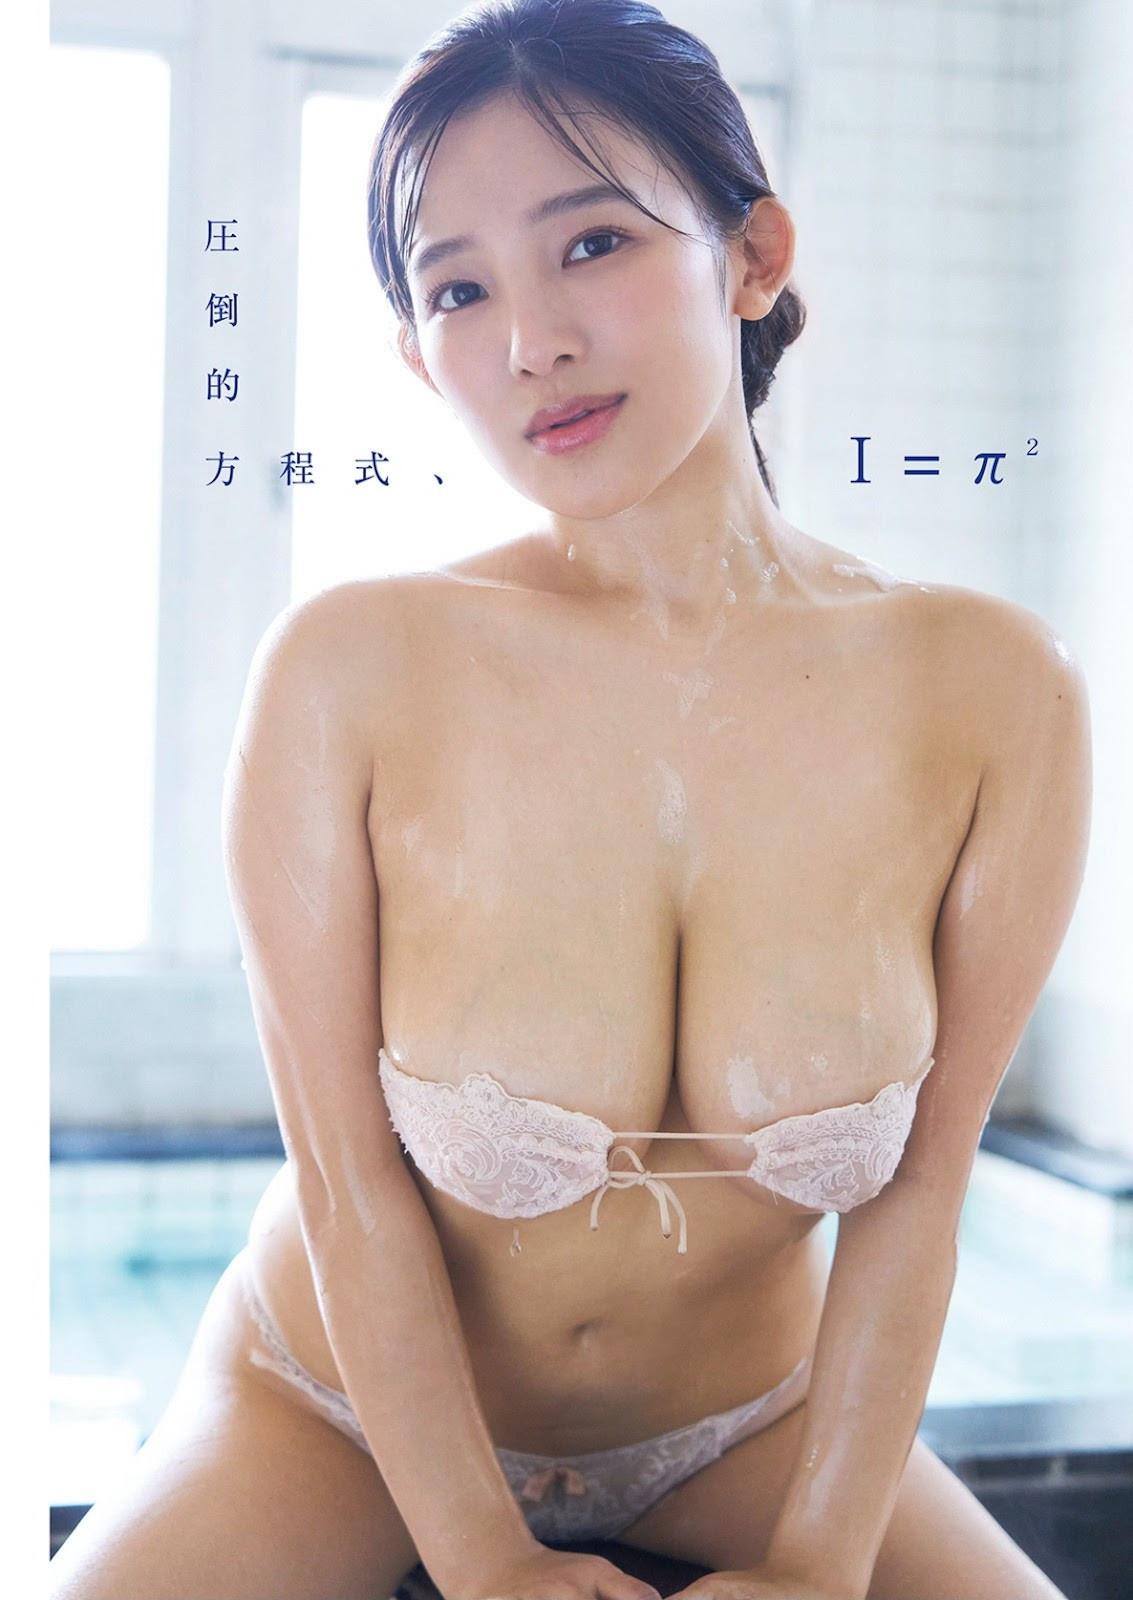 Airi Furuta 古田愛理 Jun Amaki 天木じゅん 2-003